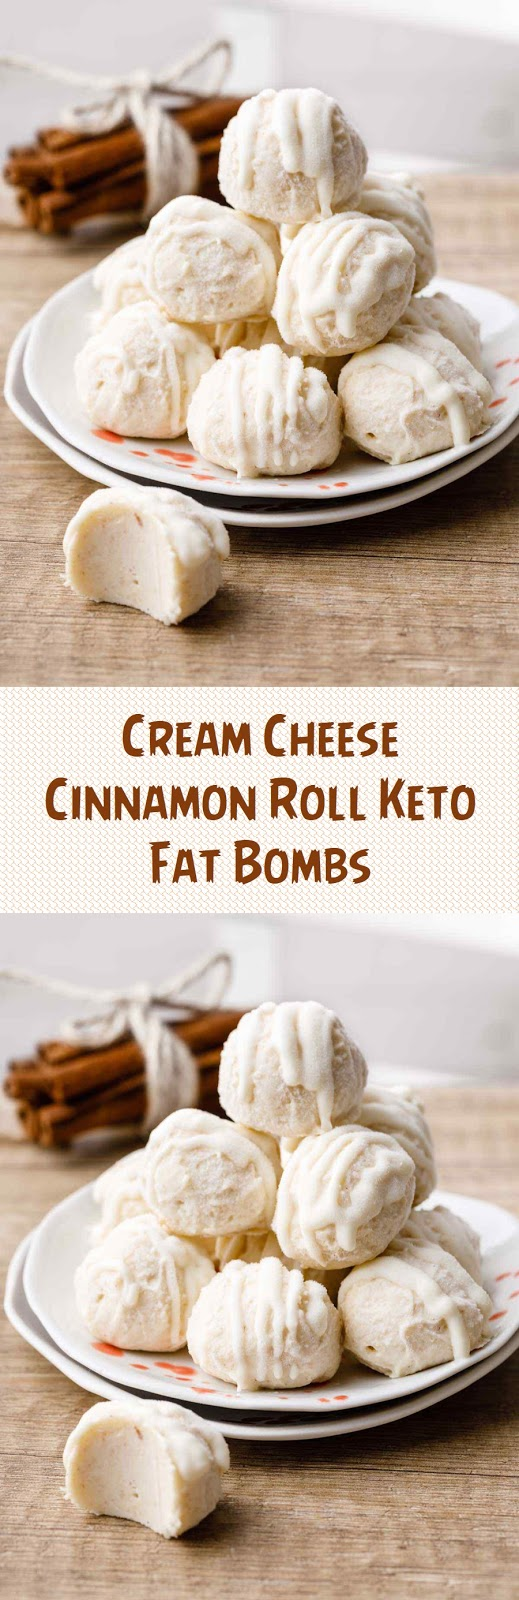 Cream Cheese Cinnamon Roll Keto Fat Bombs